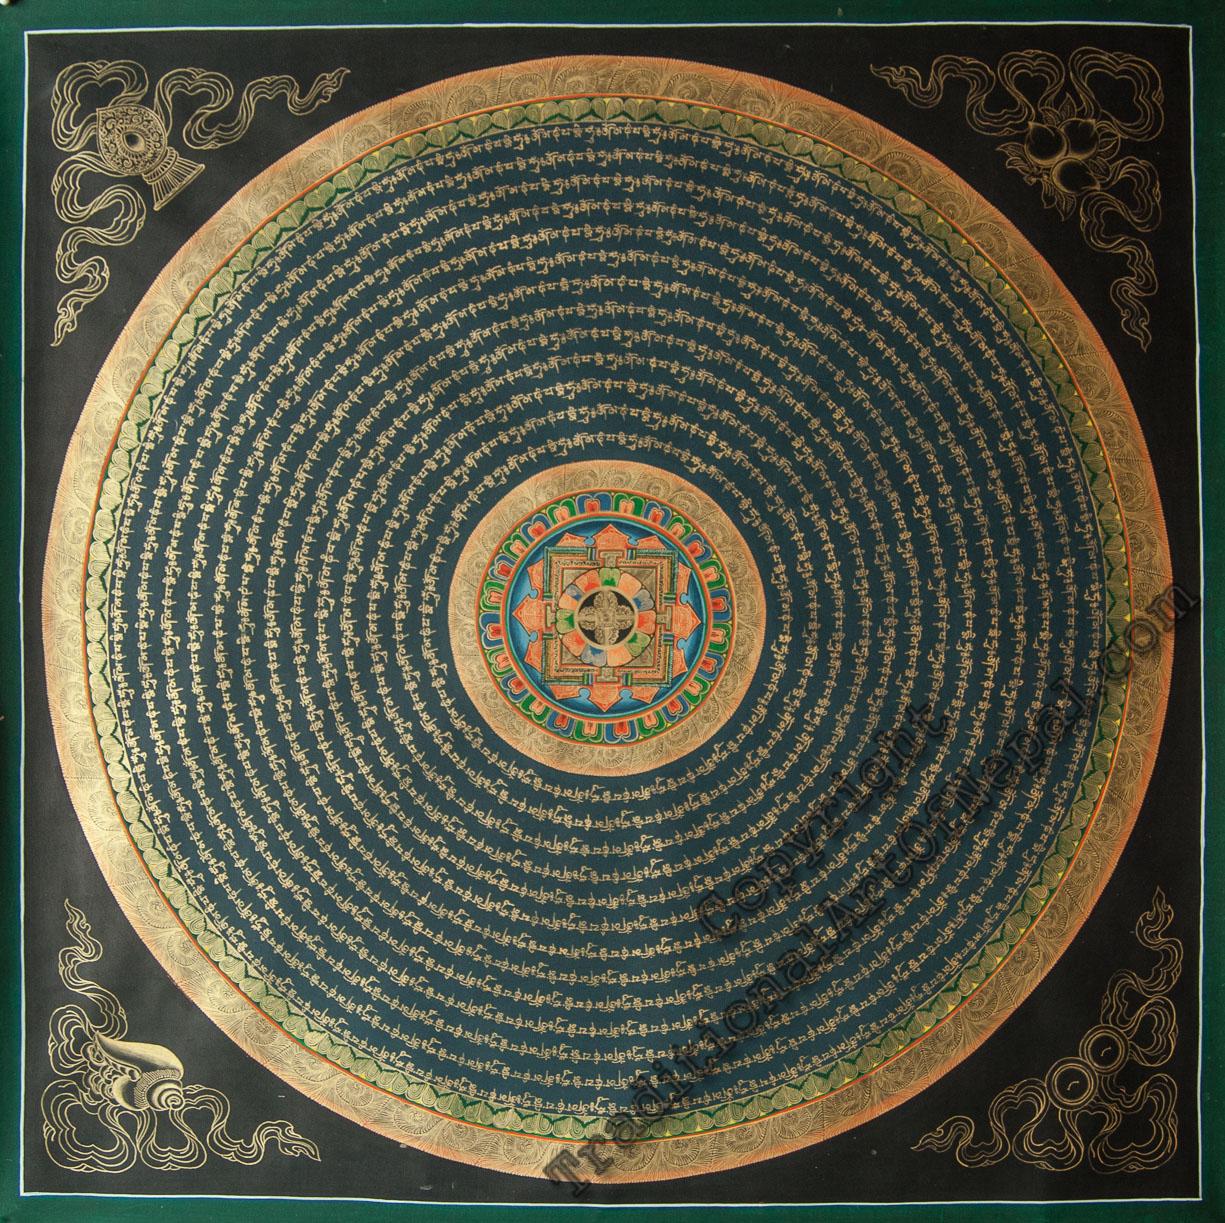 Gold painted Mandala